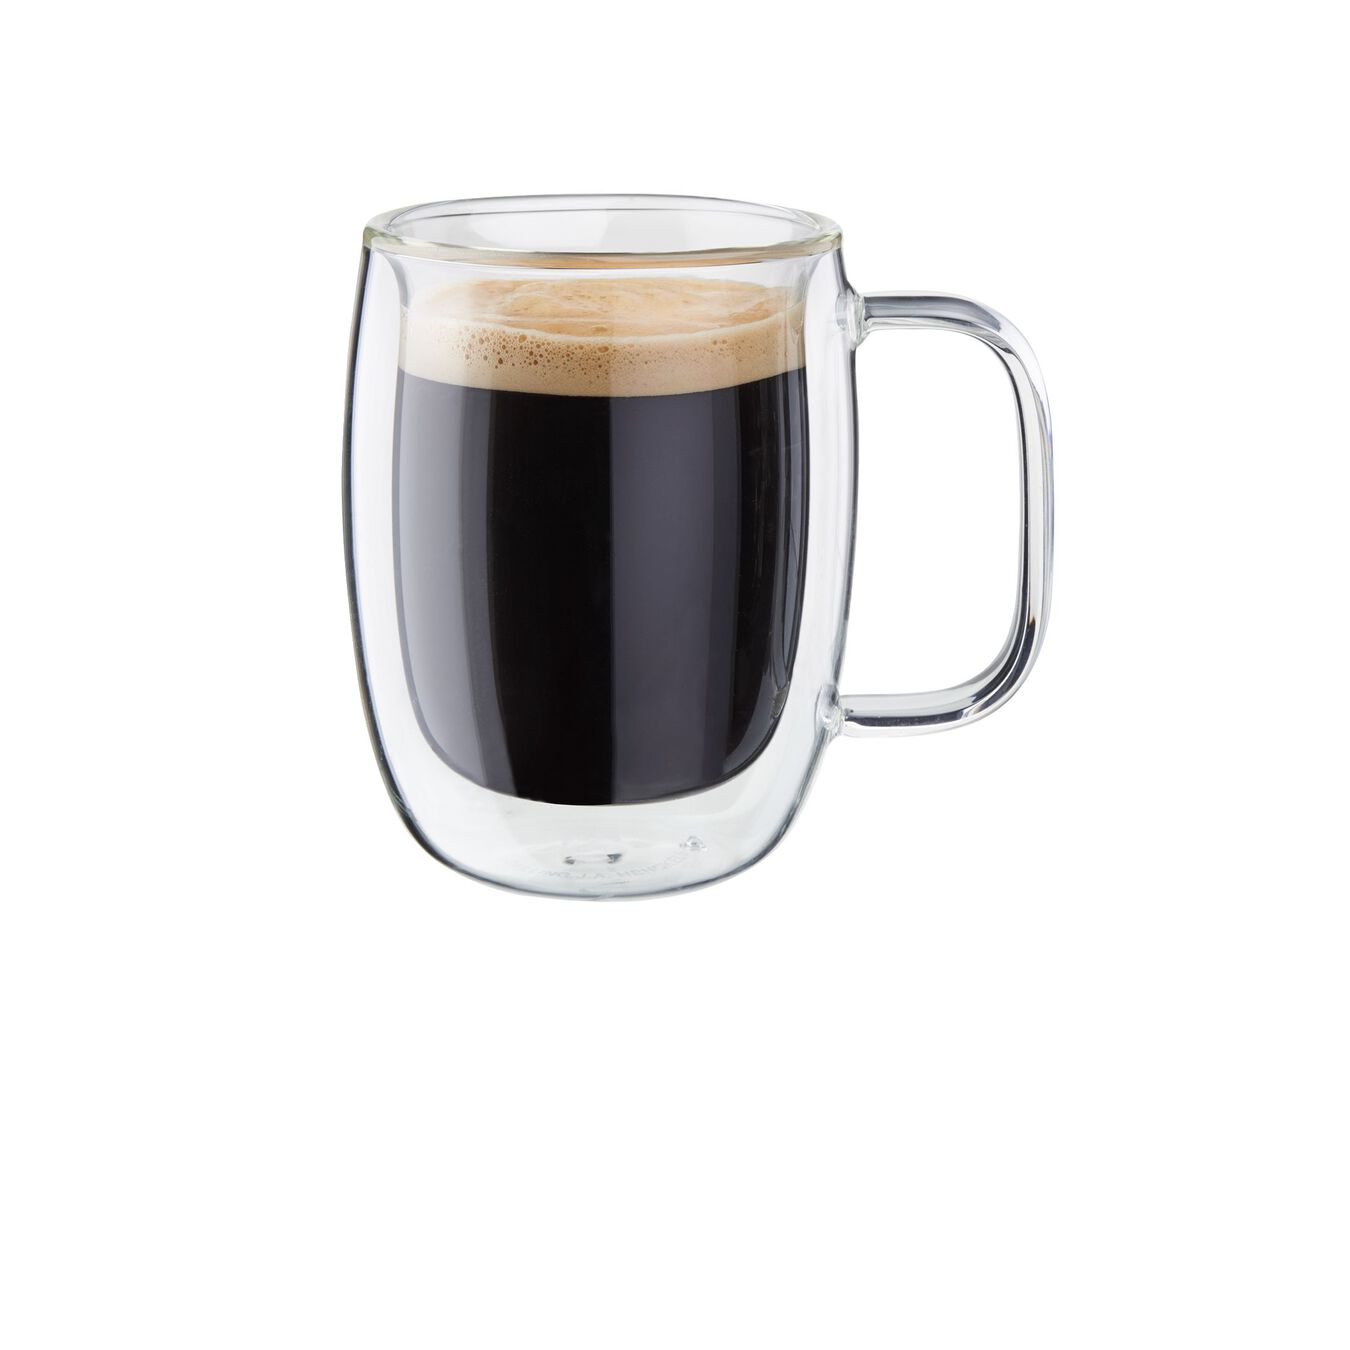 2-pc Double-Wall Glass Double Espresso Mug Set,,large 1